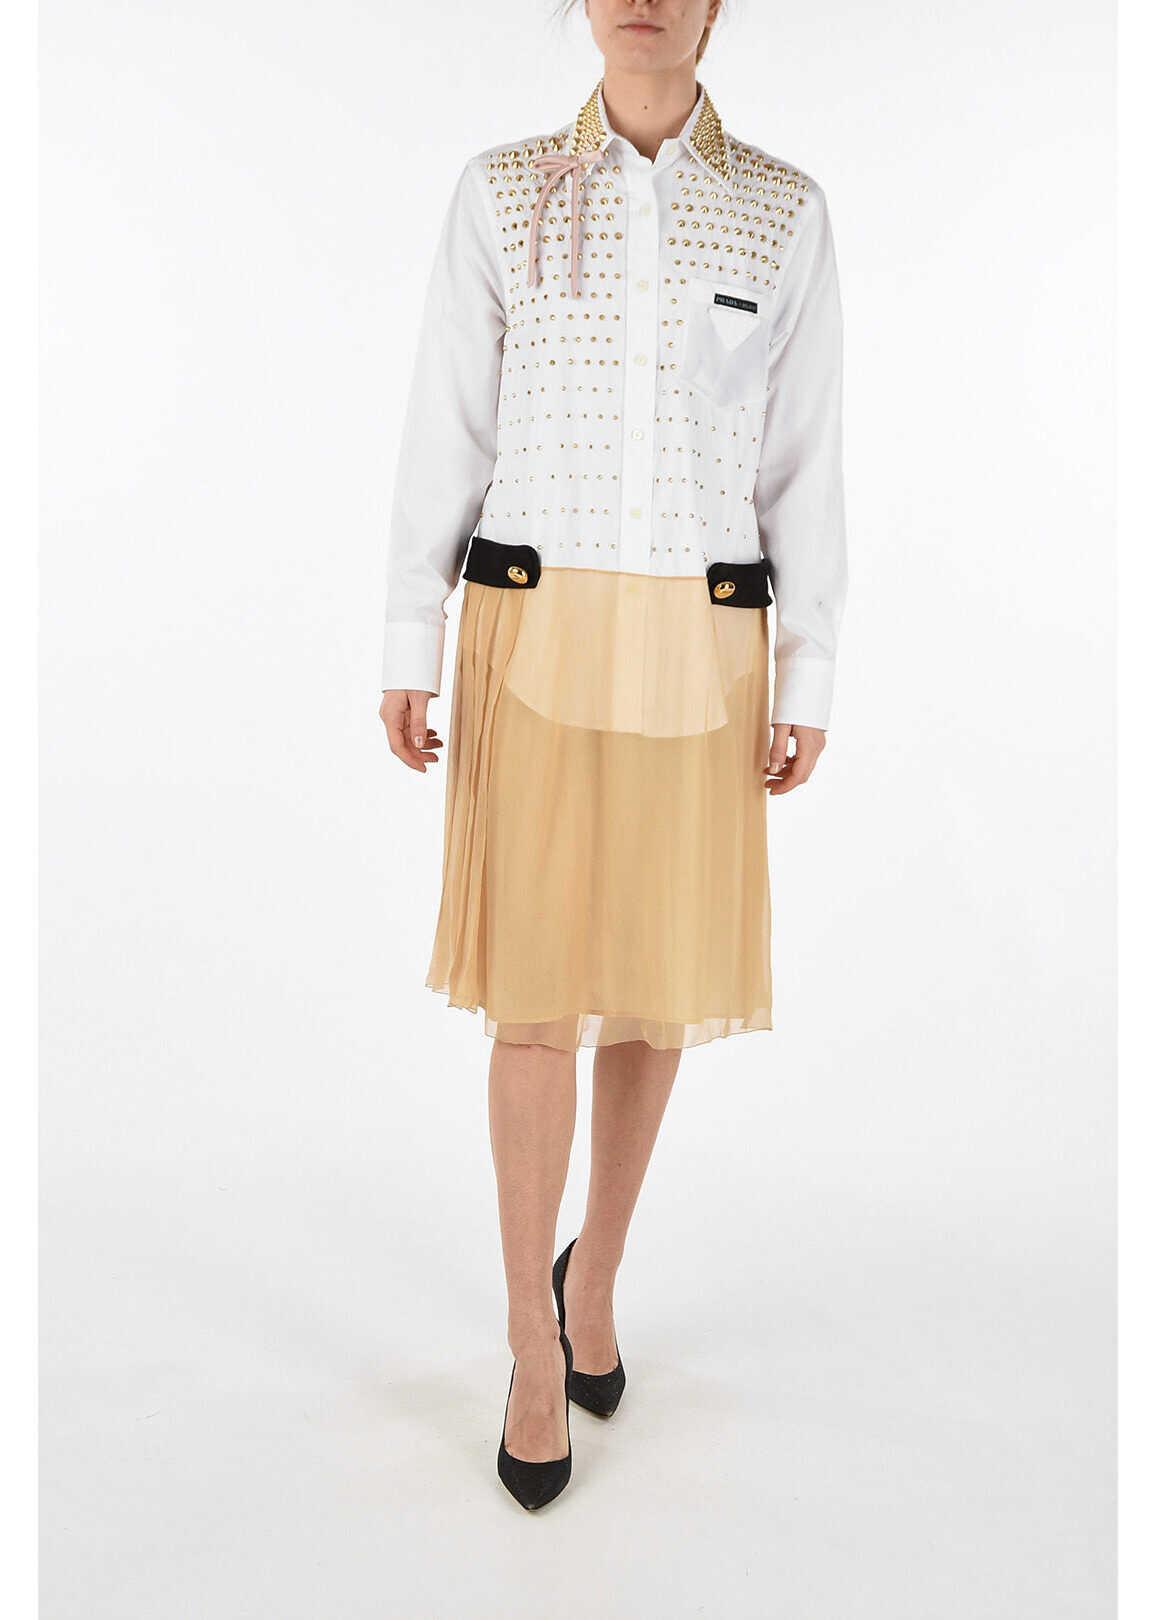 Prada u-shape backline studded shirtdress WHITE